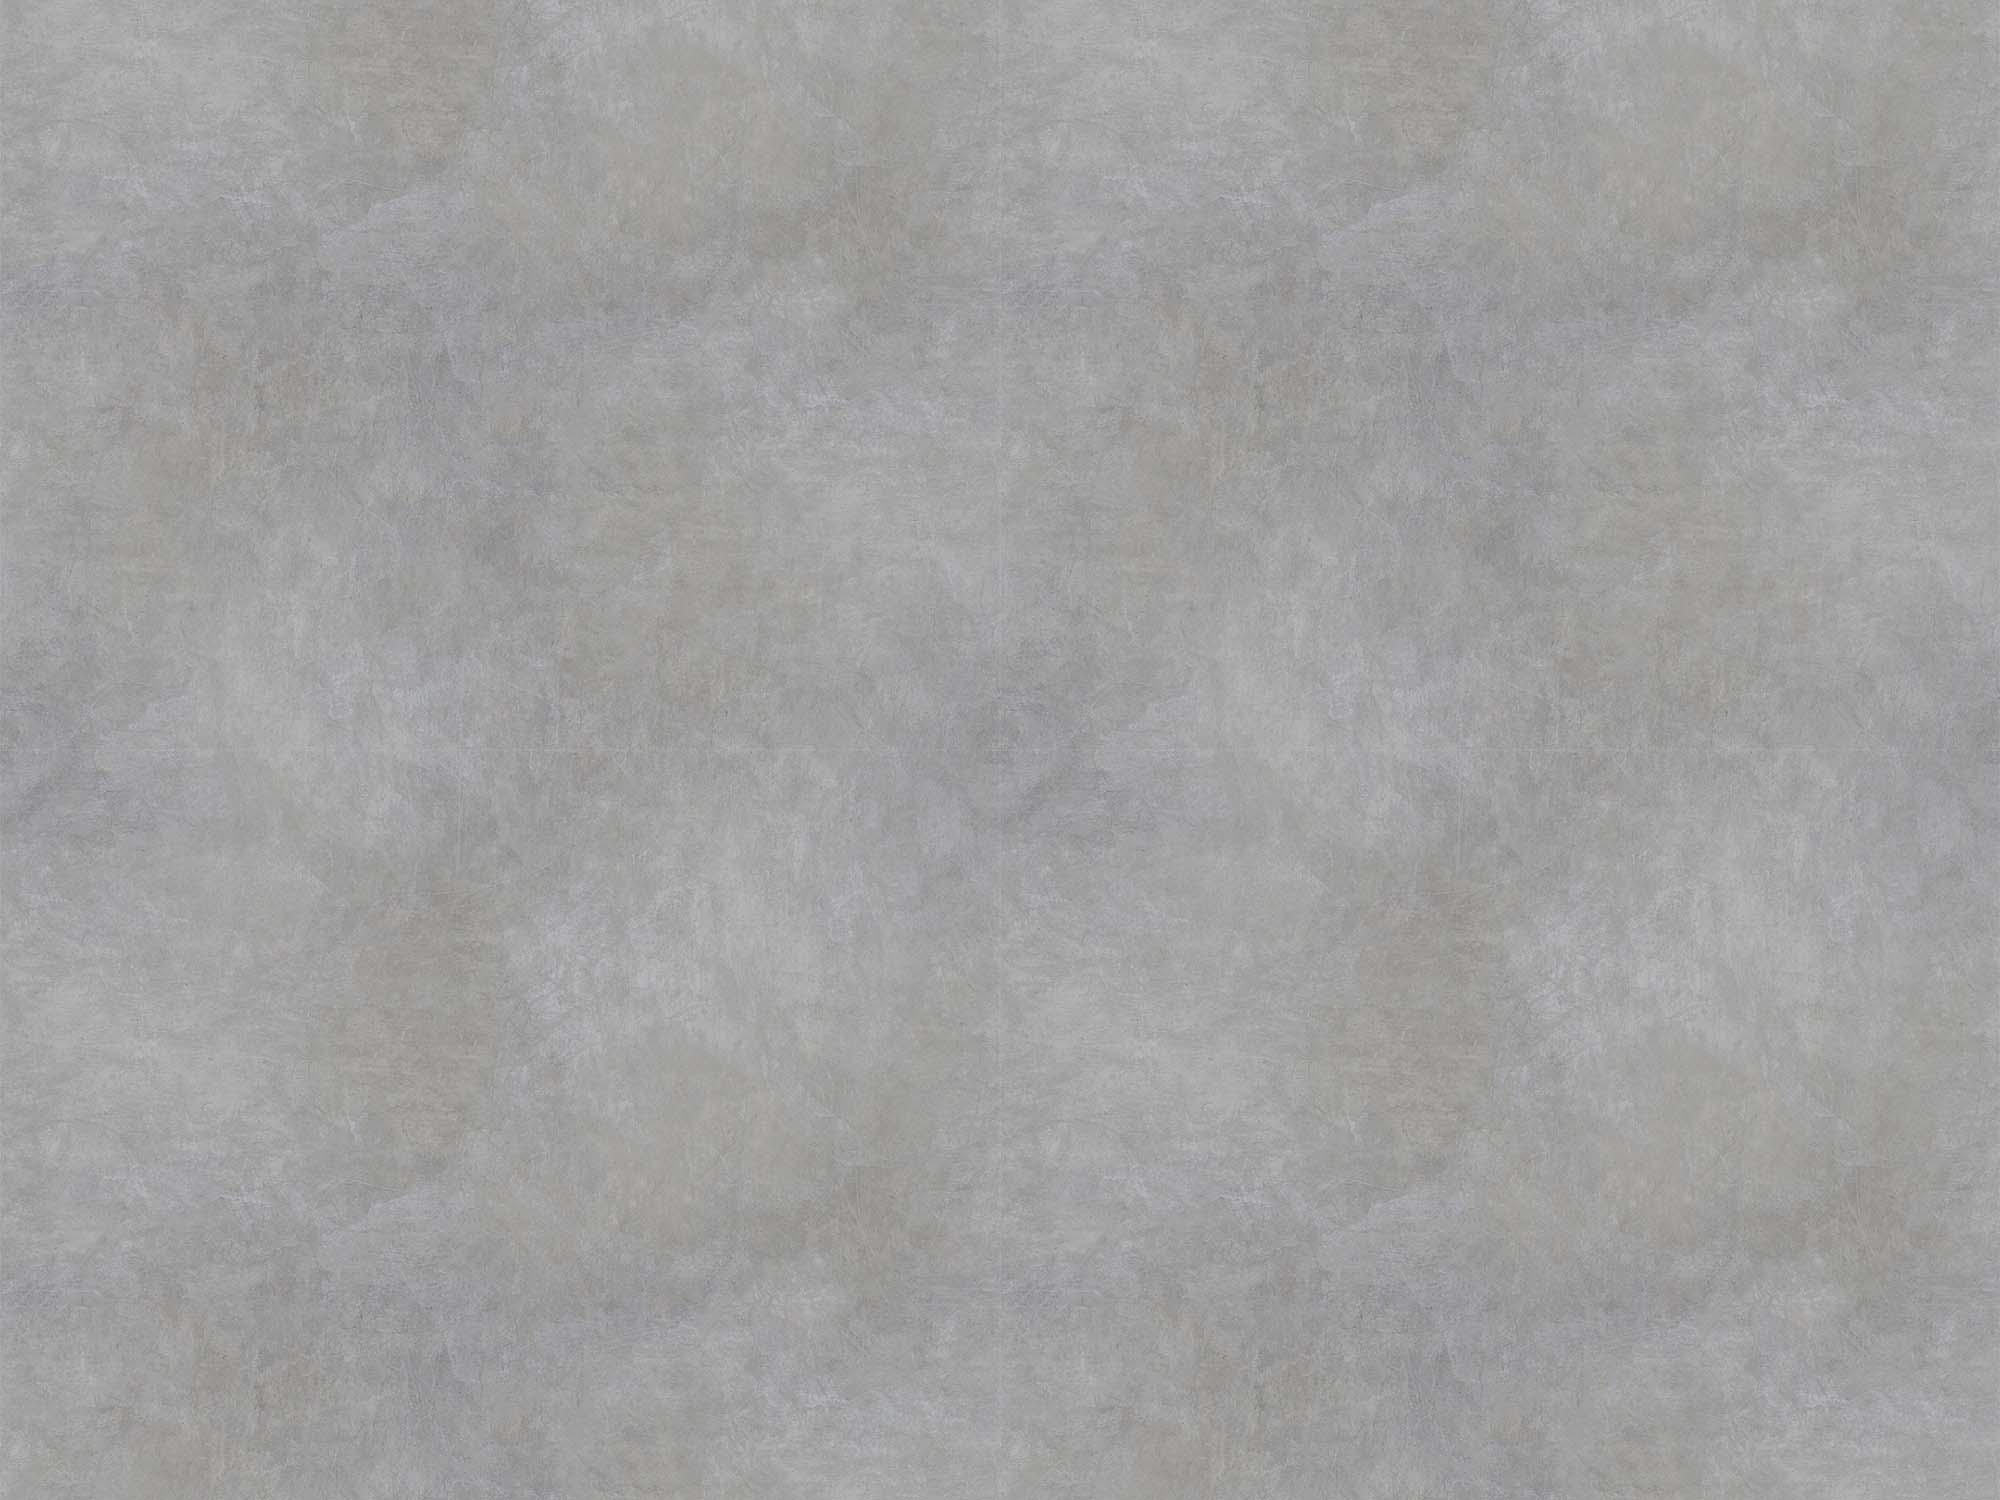 3 Free Seamless Concrete Wall Textures Jpg,Housewarming Gift Ideas Diy